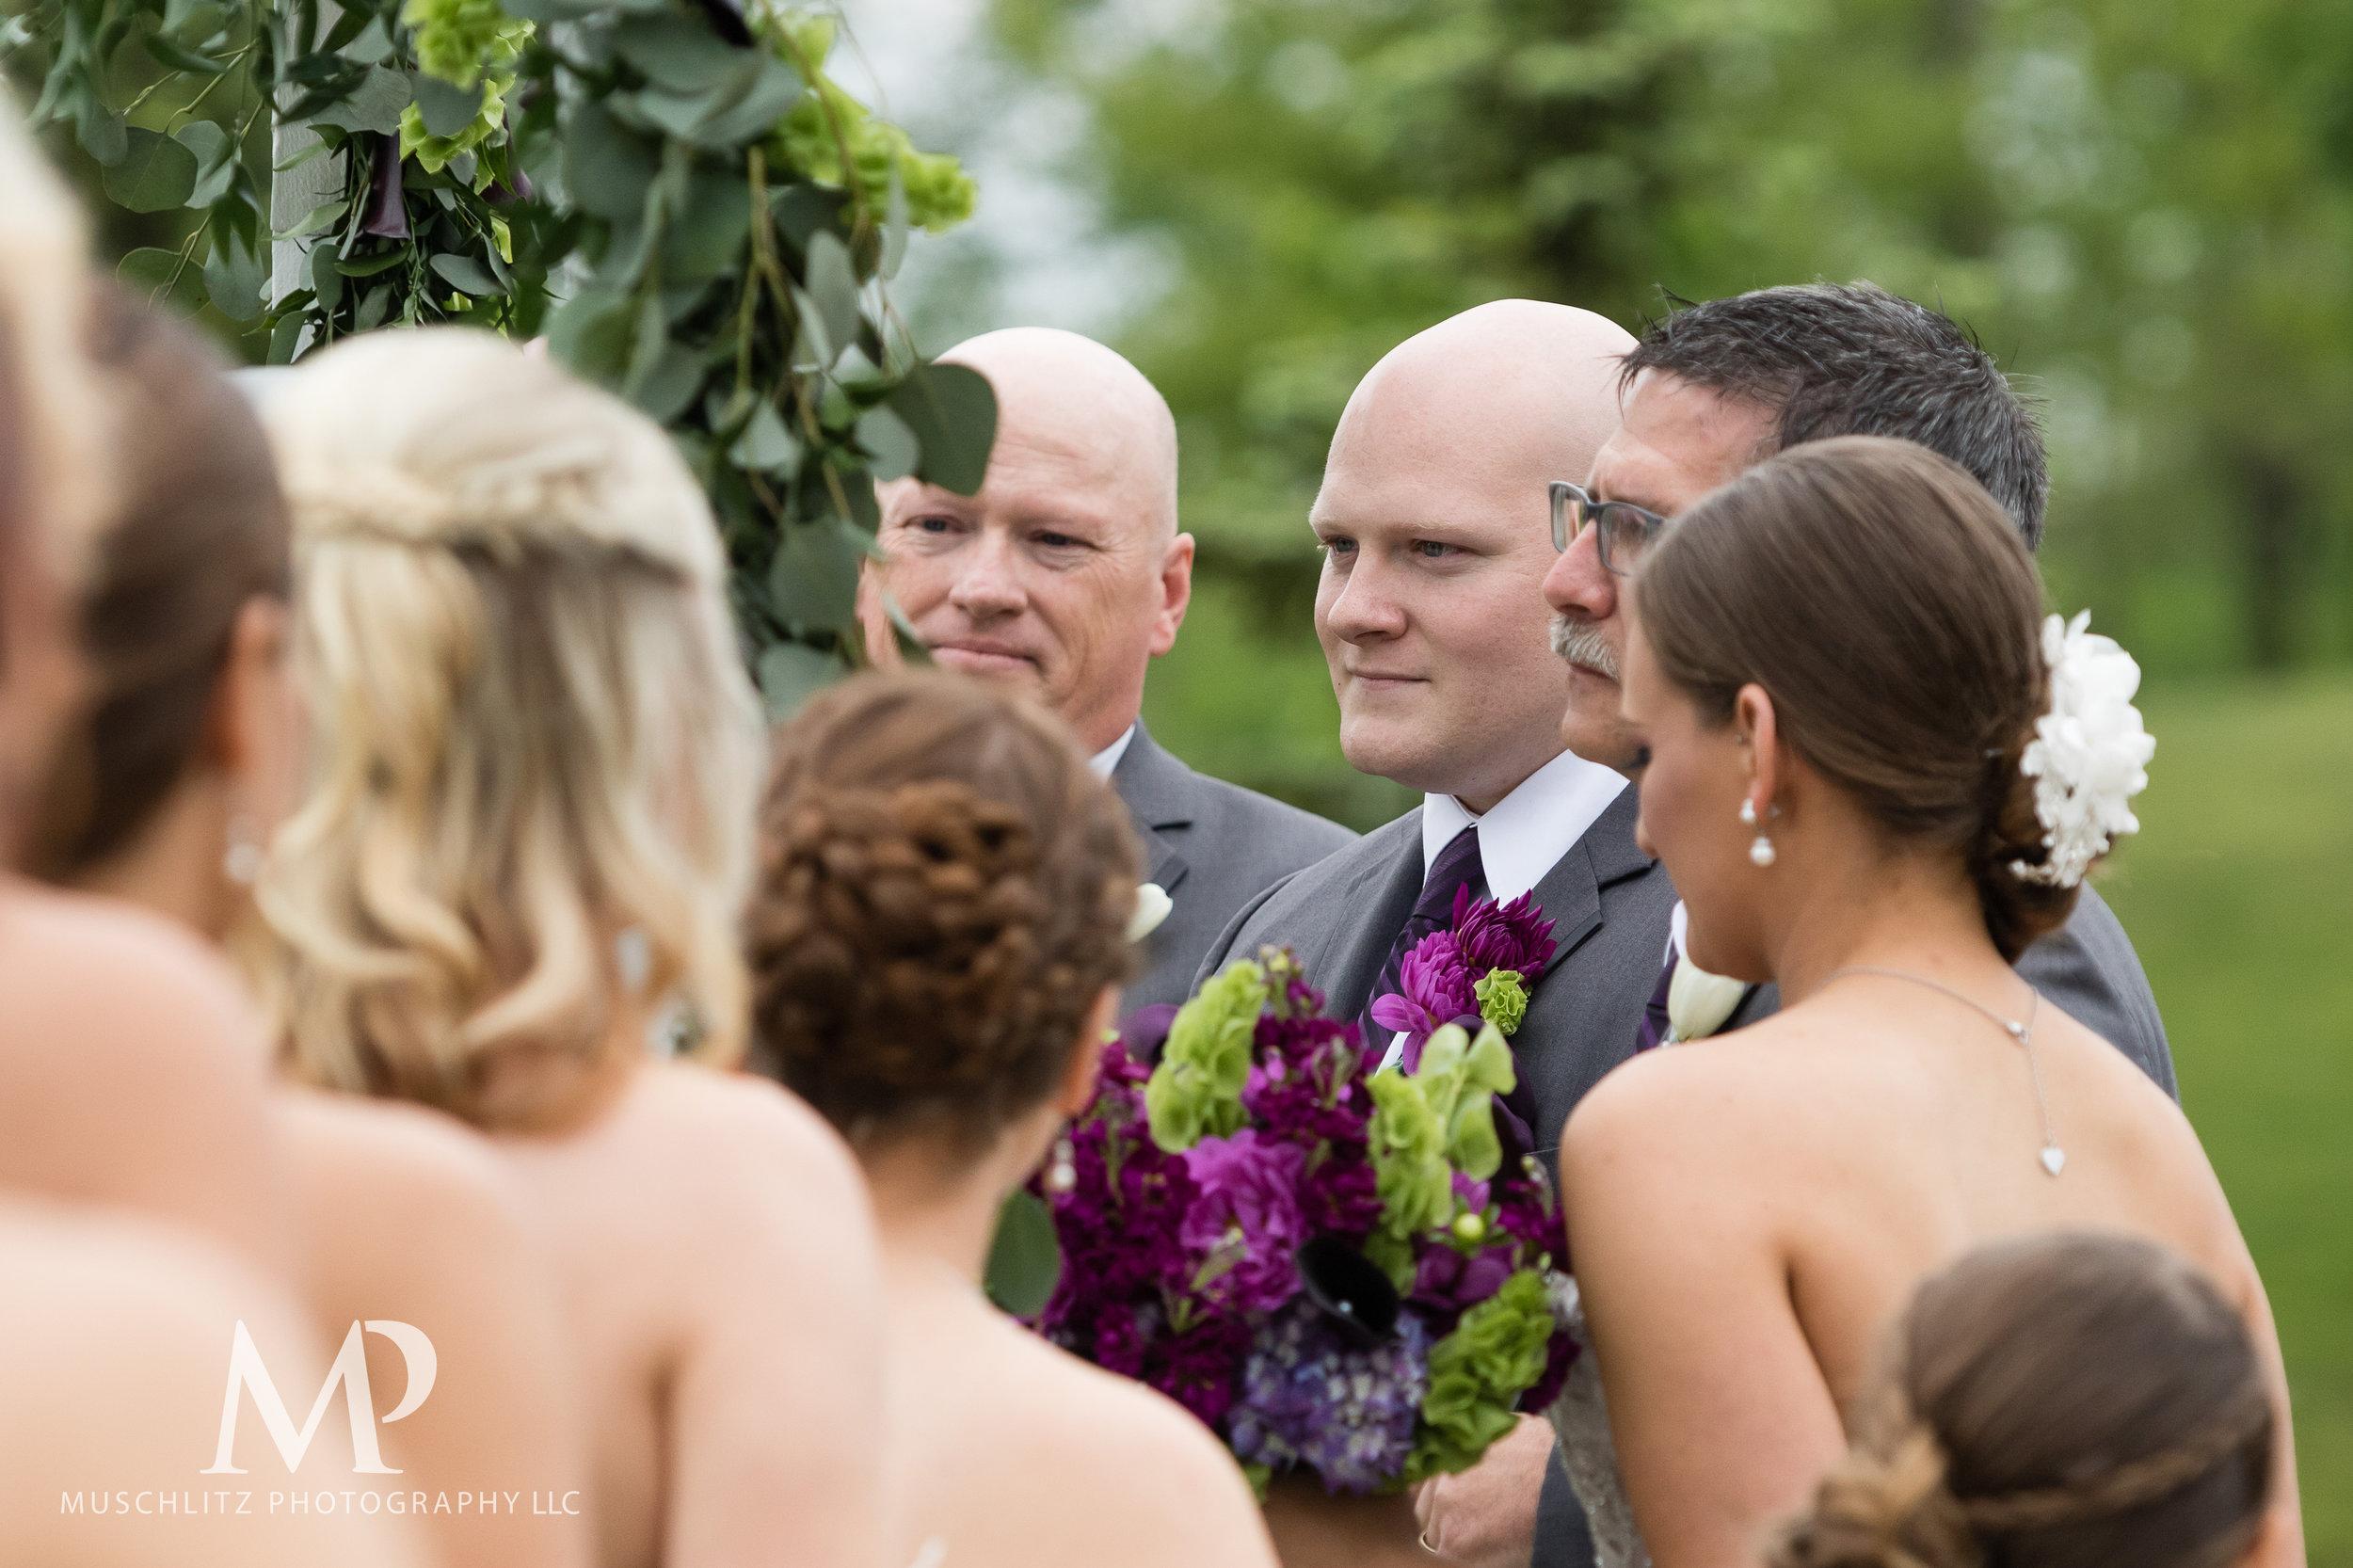 club-at-corazon-wedding-ceremony-reception-columbus-dublin-ohio-ohio-university-theme-029.JPG